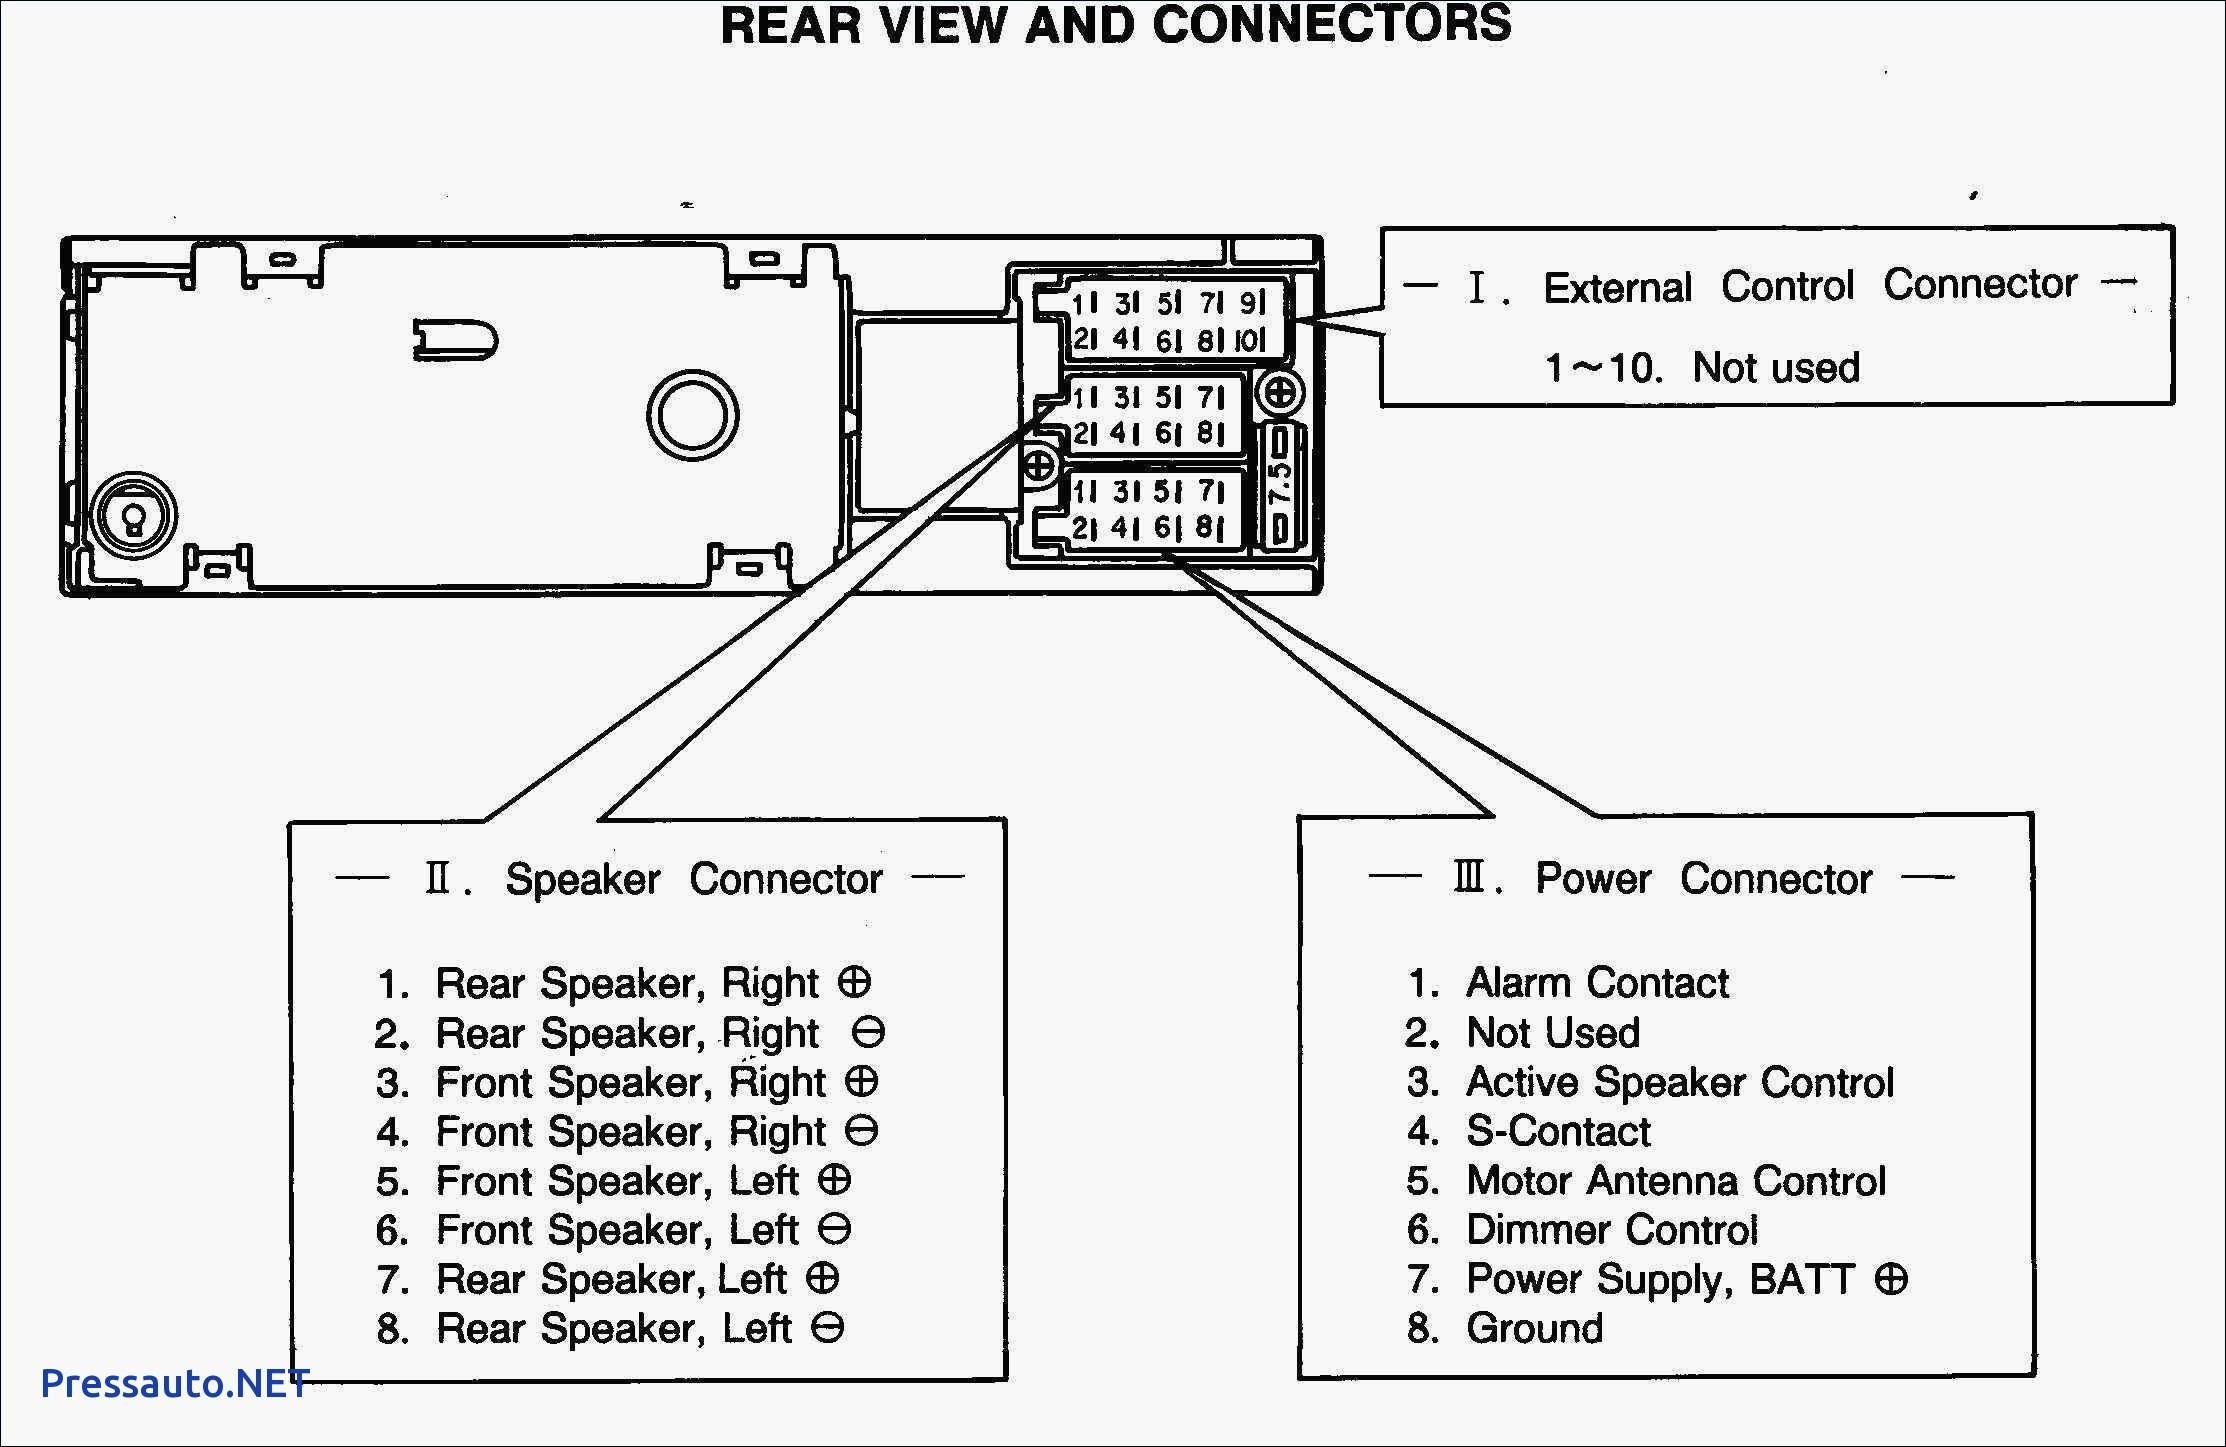 Vw Jetta Radio Wiring Diagram Tryit Me Audi 80 Wiring Diagram Vw Jetta  Wiring Diagram